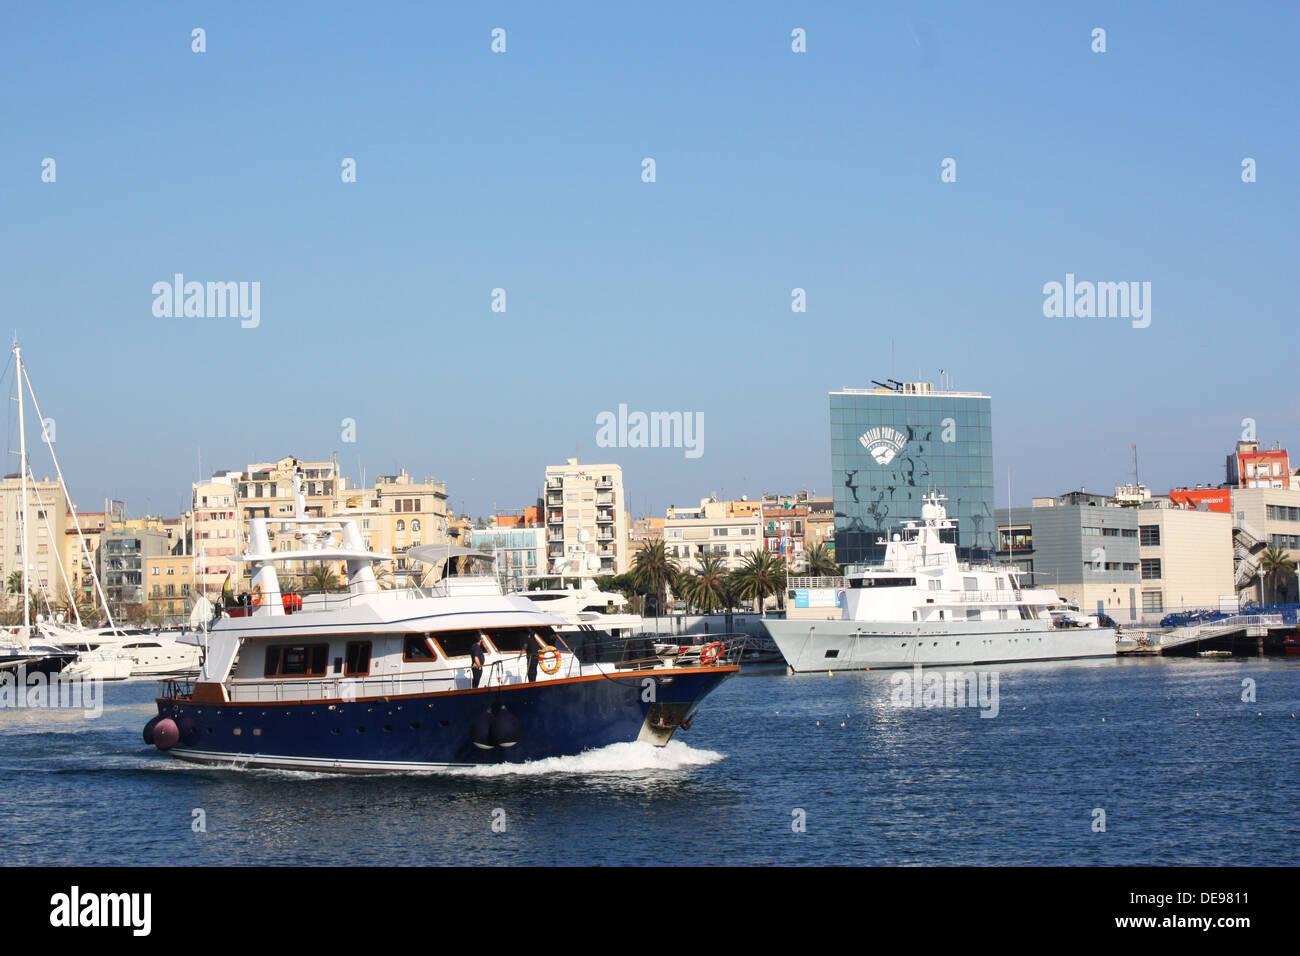 Boats in Barcelona, Spain Stock Photo